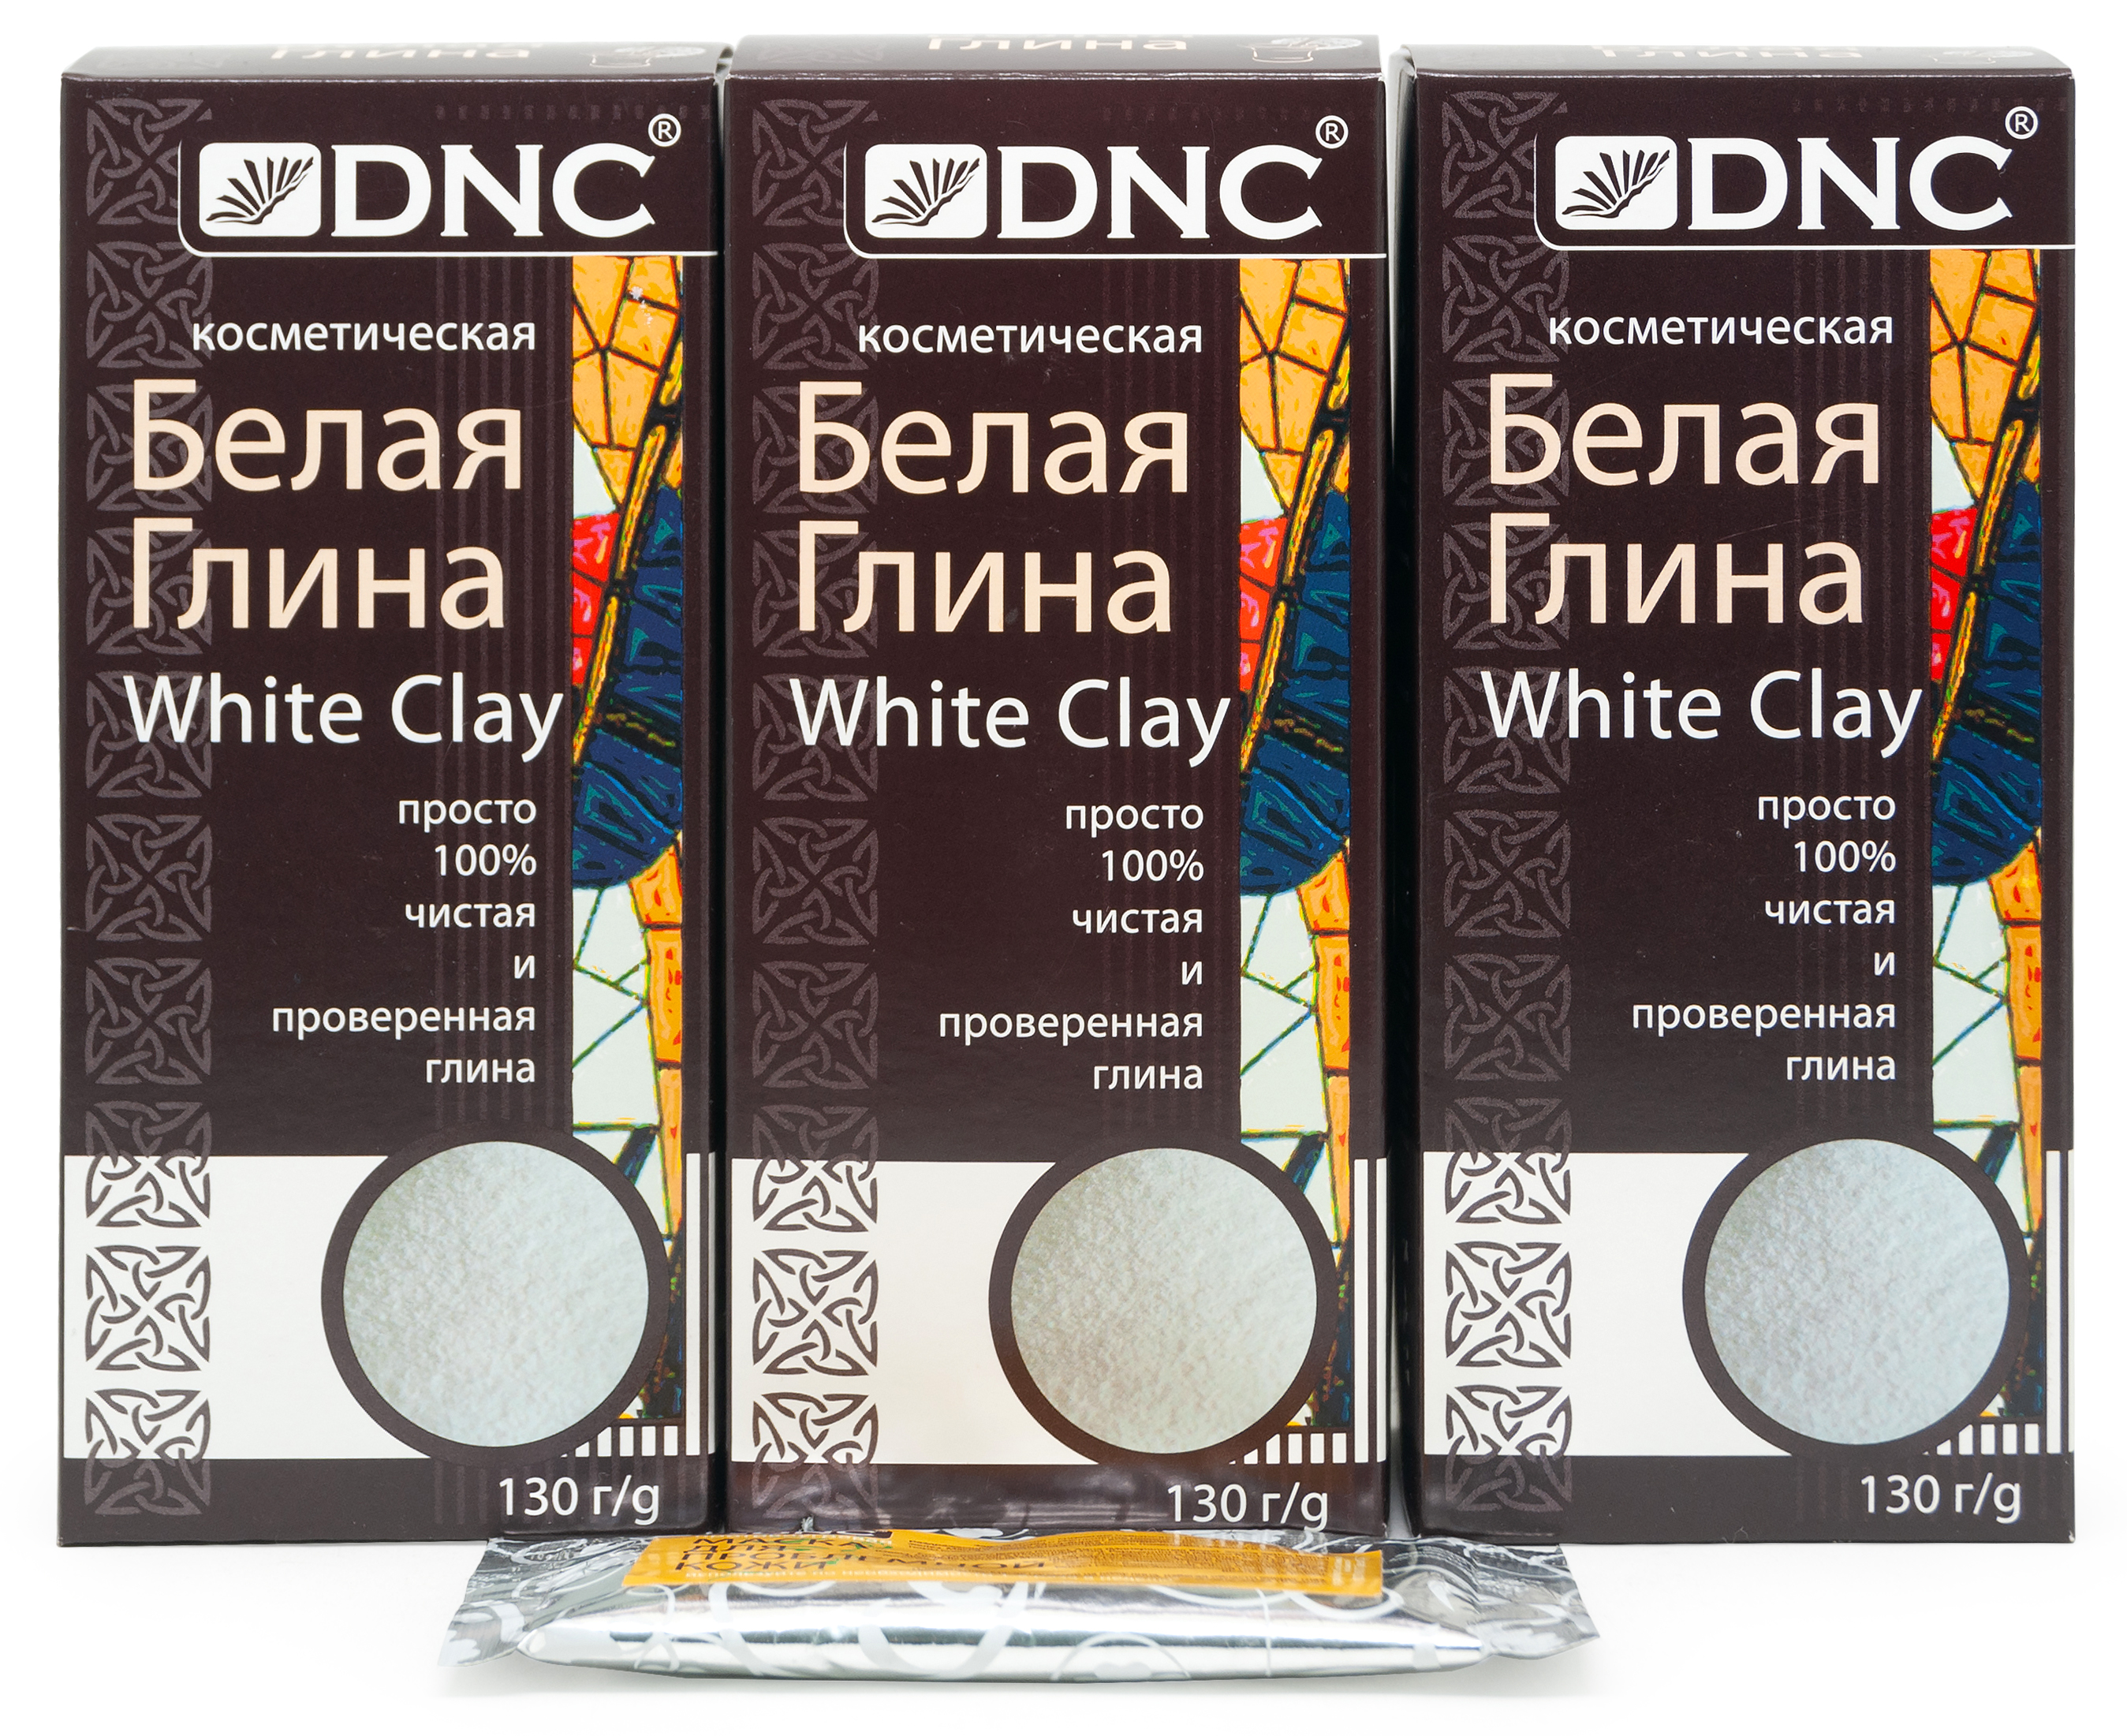 цена на Набор: DNC Глина белая 130 г * 3 шт + Подарок Маска для лица 15 мл